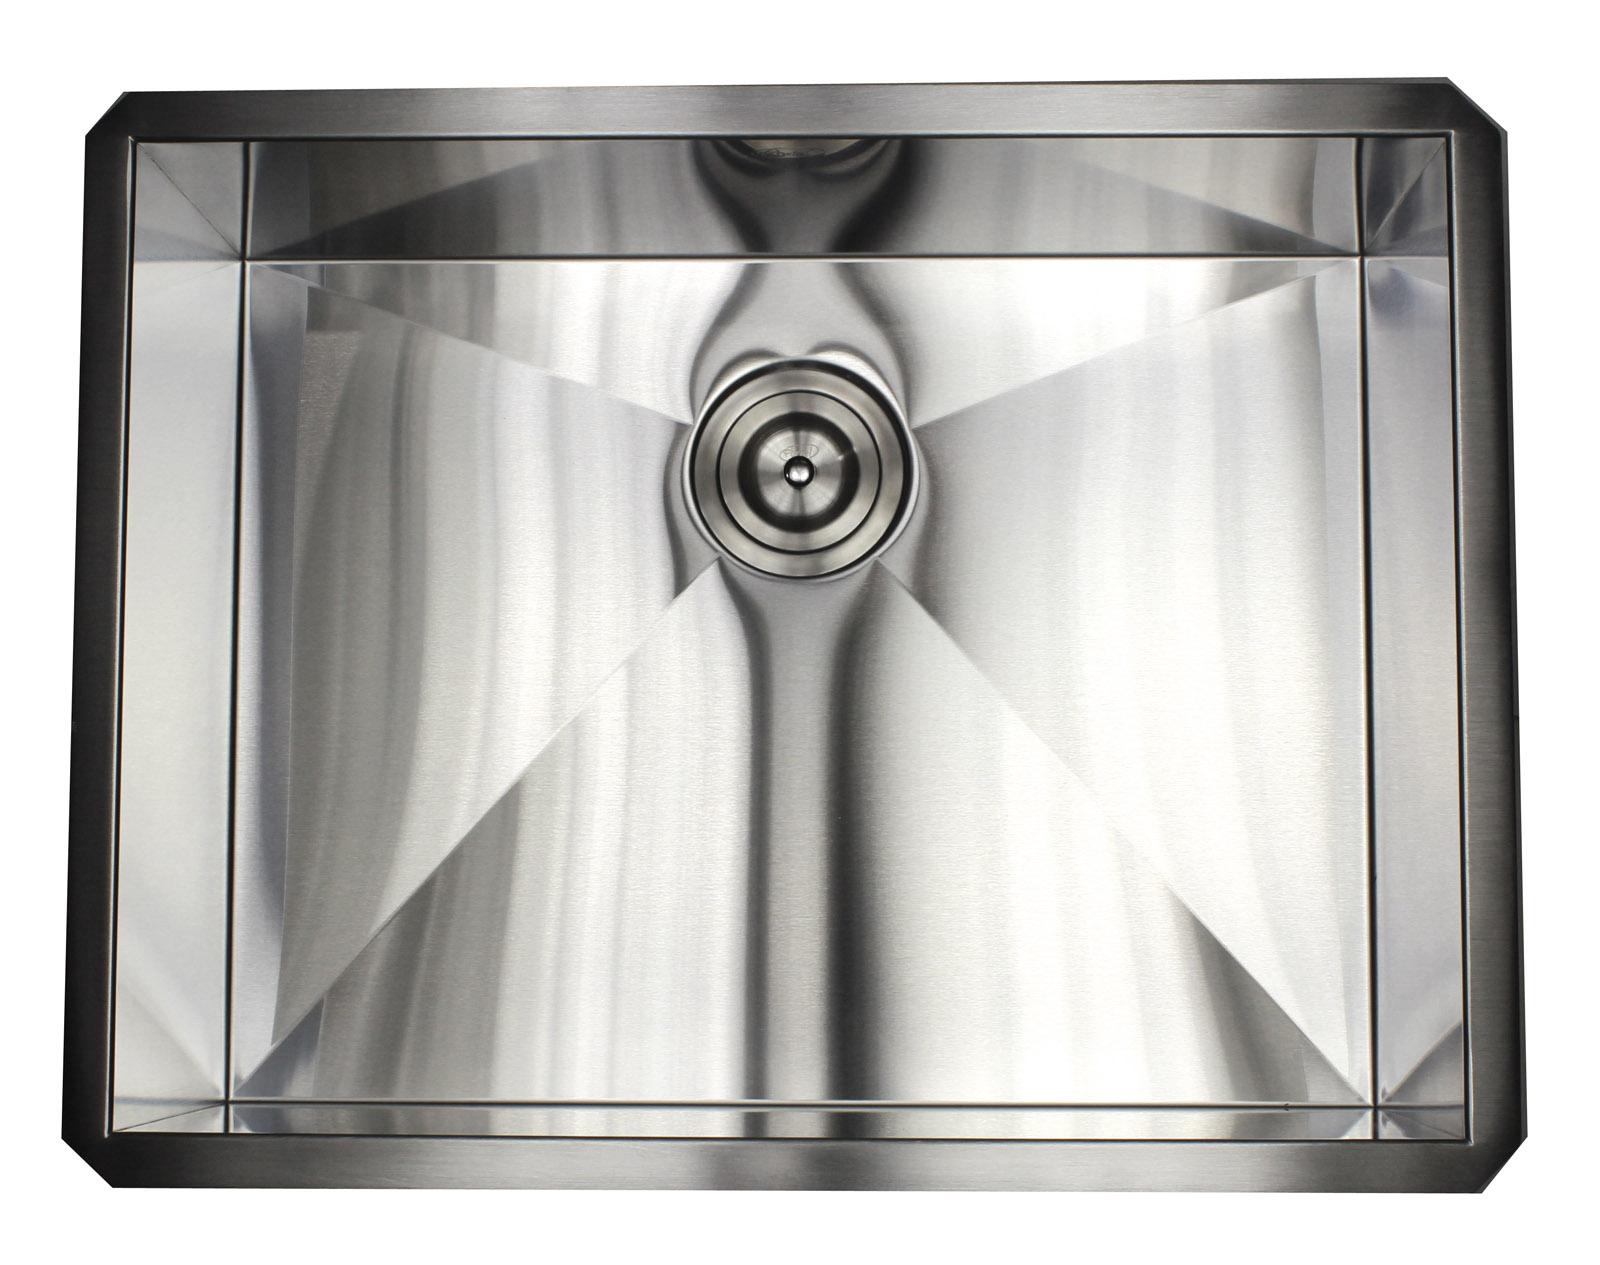 Ariel 26 Quot Zero Radius Single Bowl Stainless Steel Kitchen